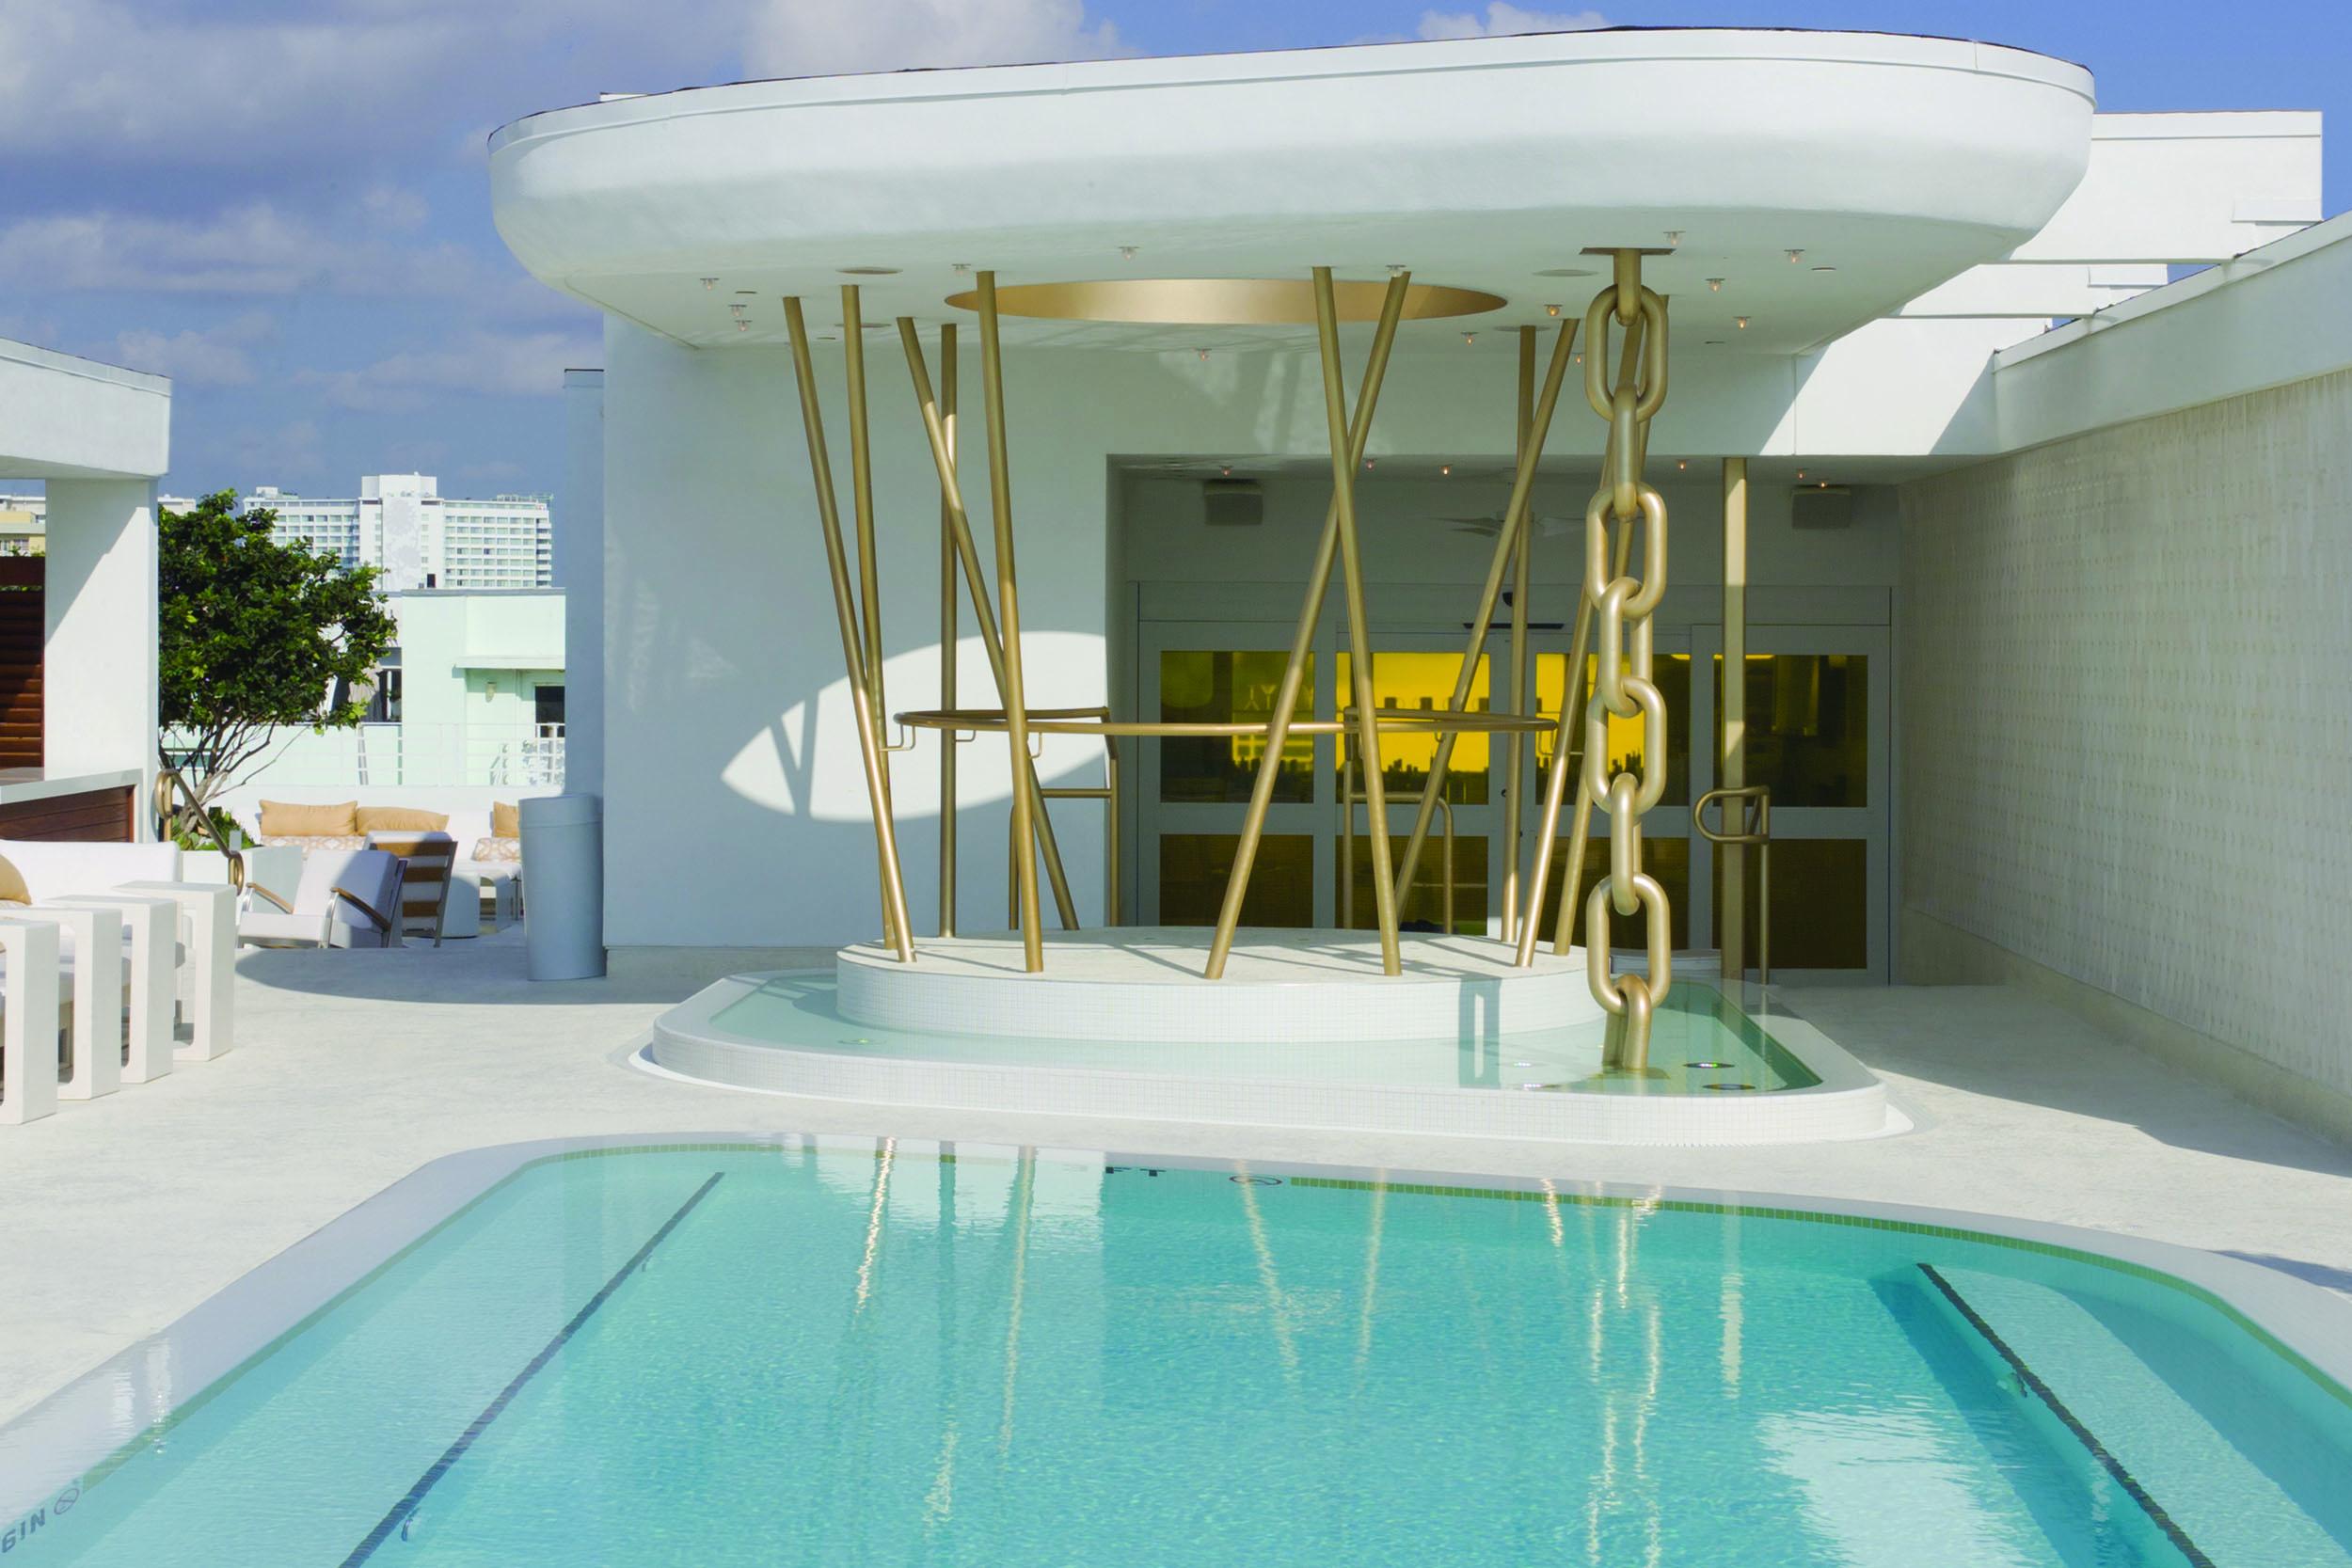 Miami's 10 best rooftop bars